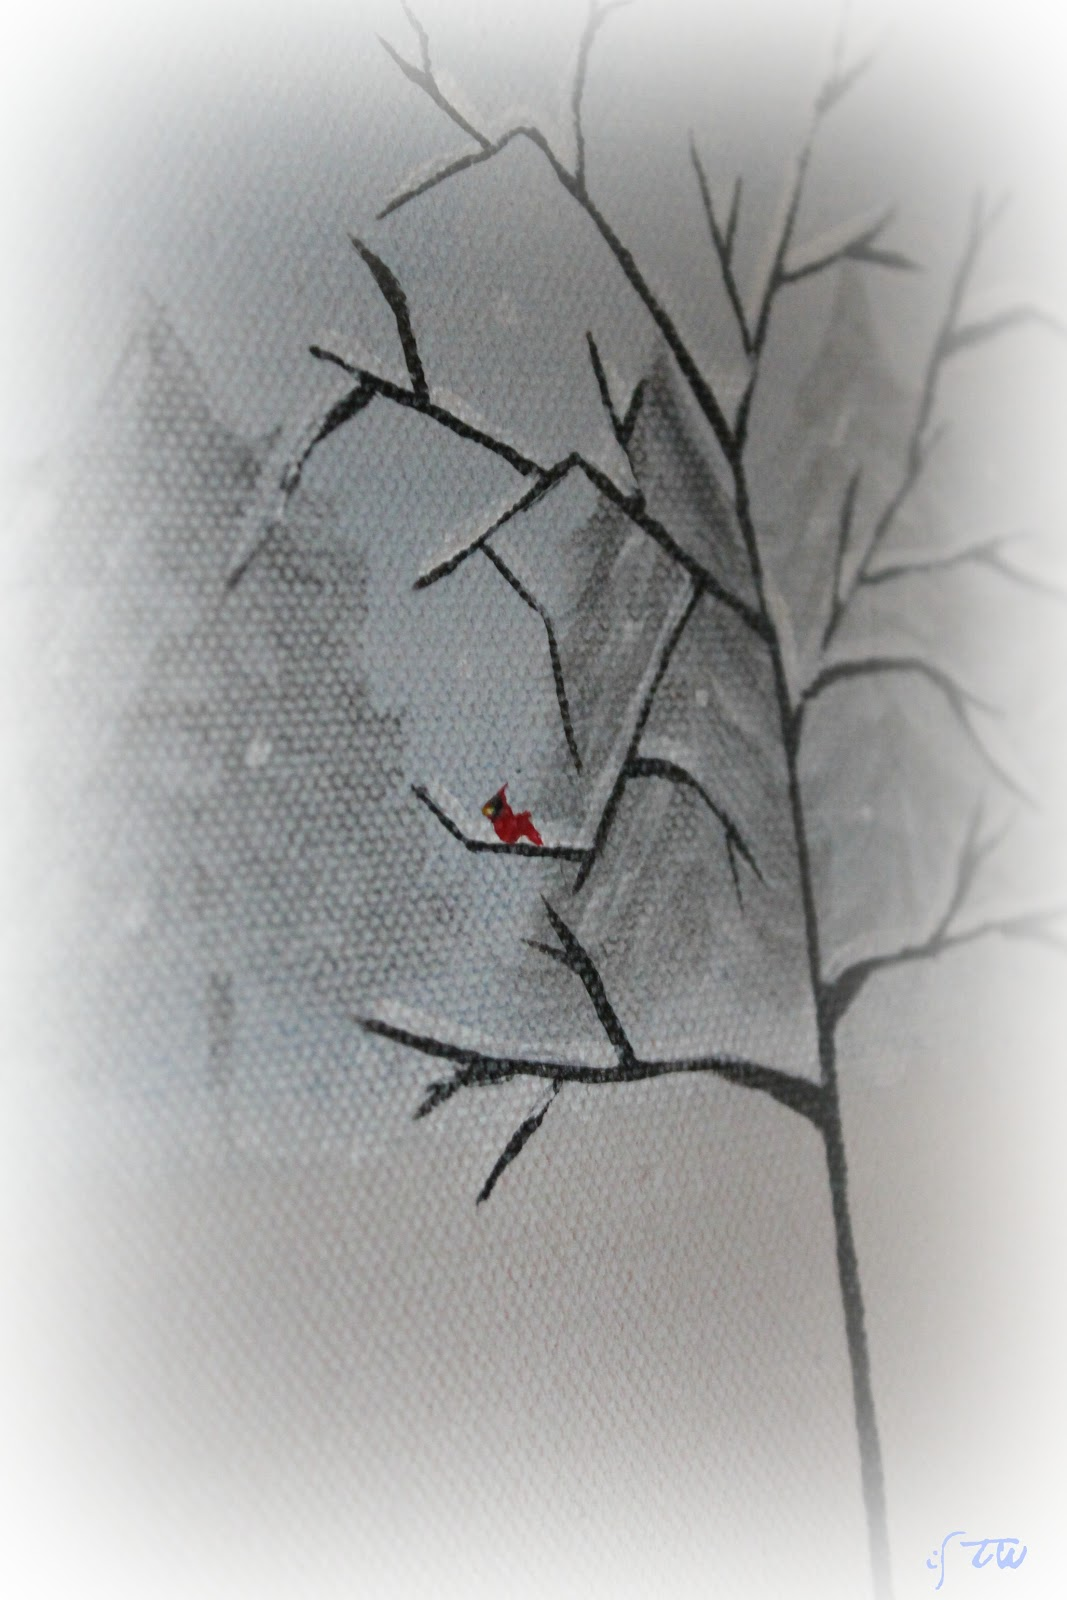 ISavor The Weekend: A Very Simple Winter Mantel